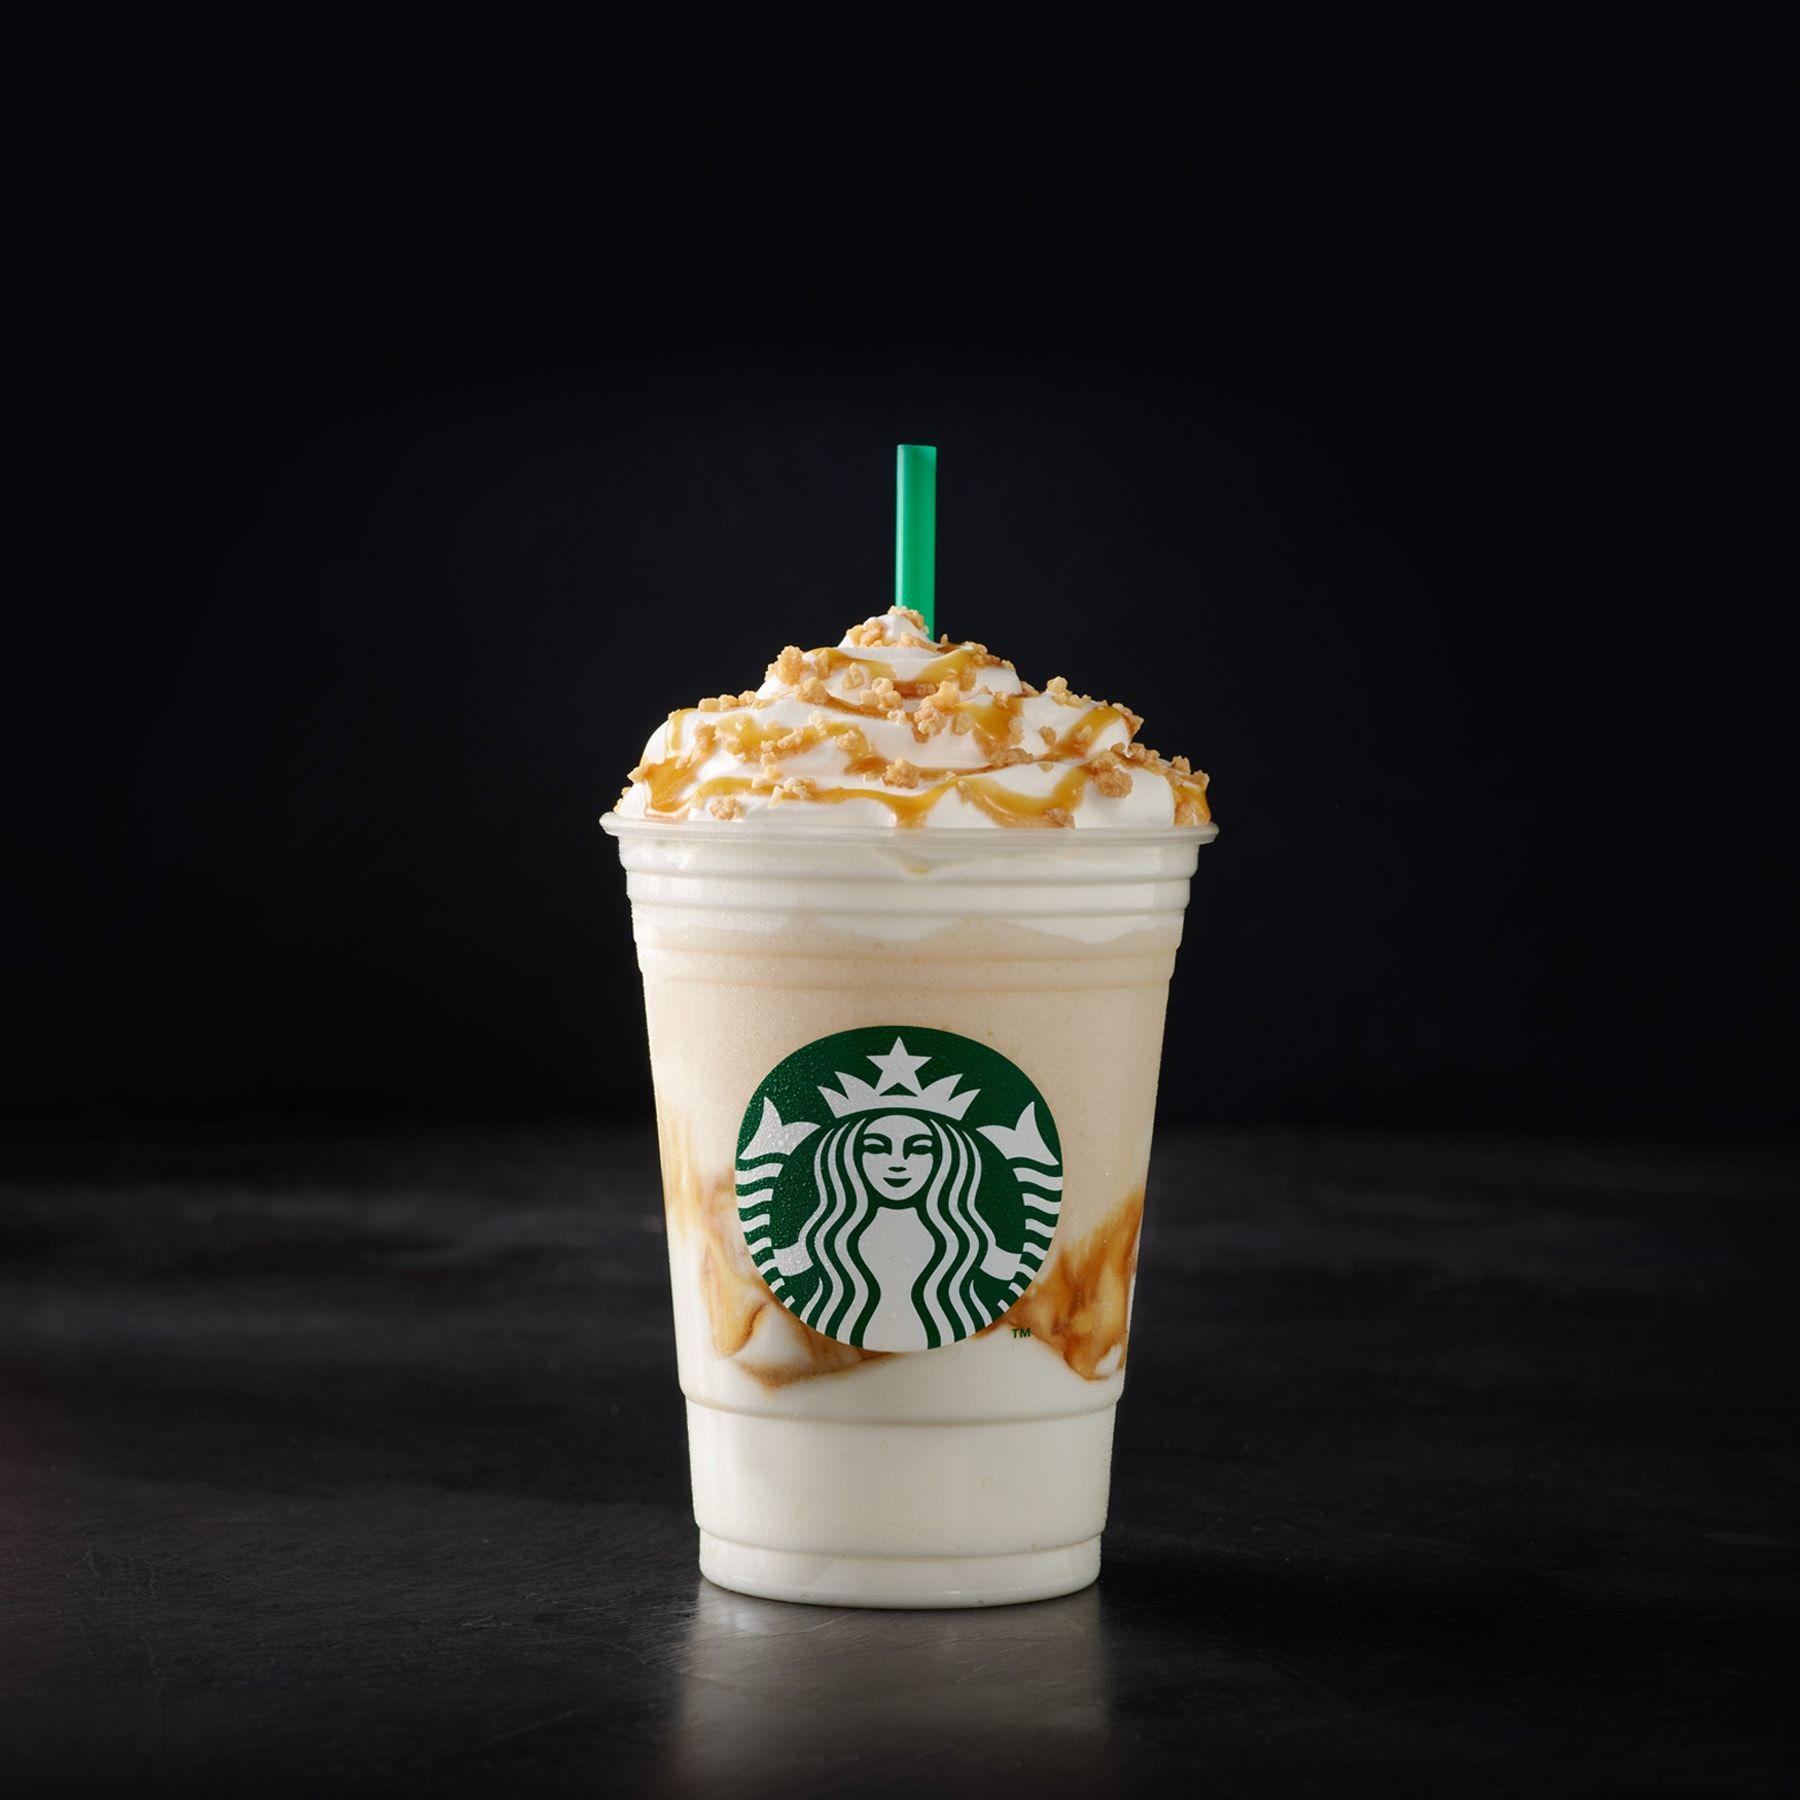 Caramel Ribbon Crunch Creme Frappuccino Starbucks Coffee Company Frappuccino Starbucks Drinks Starbucks Frappuccino